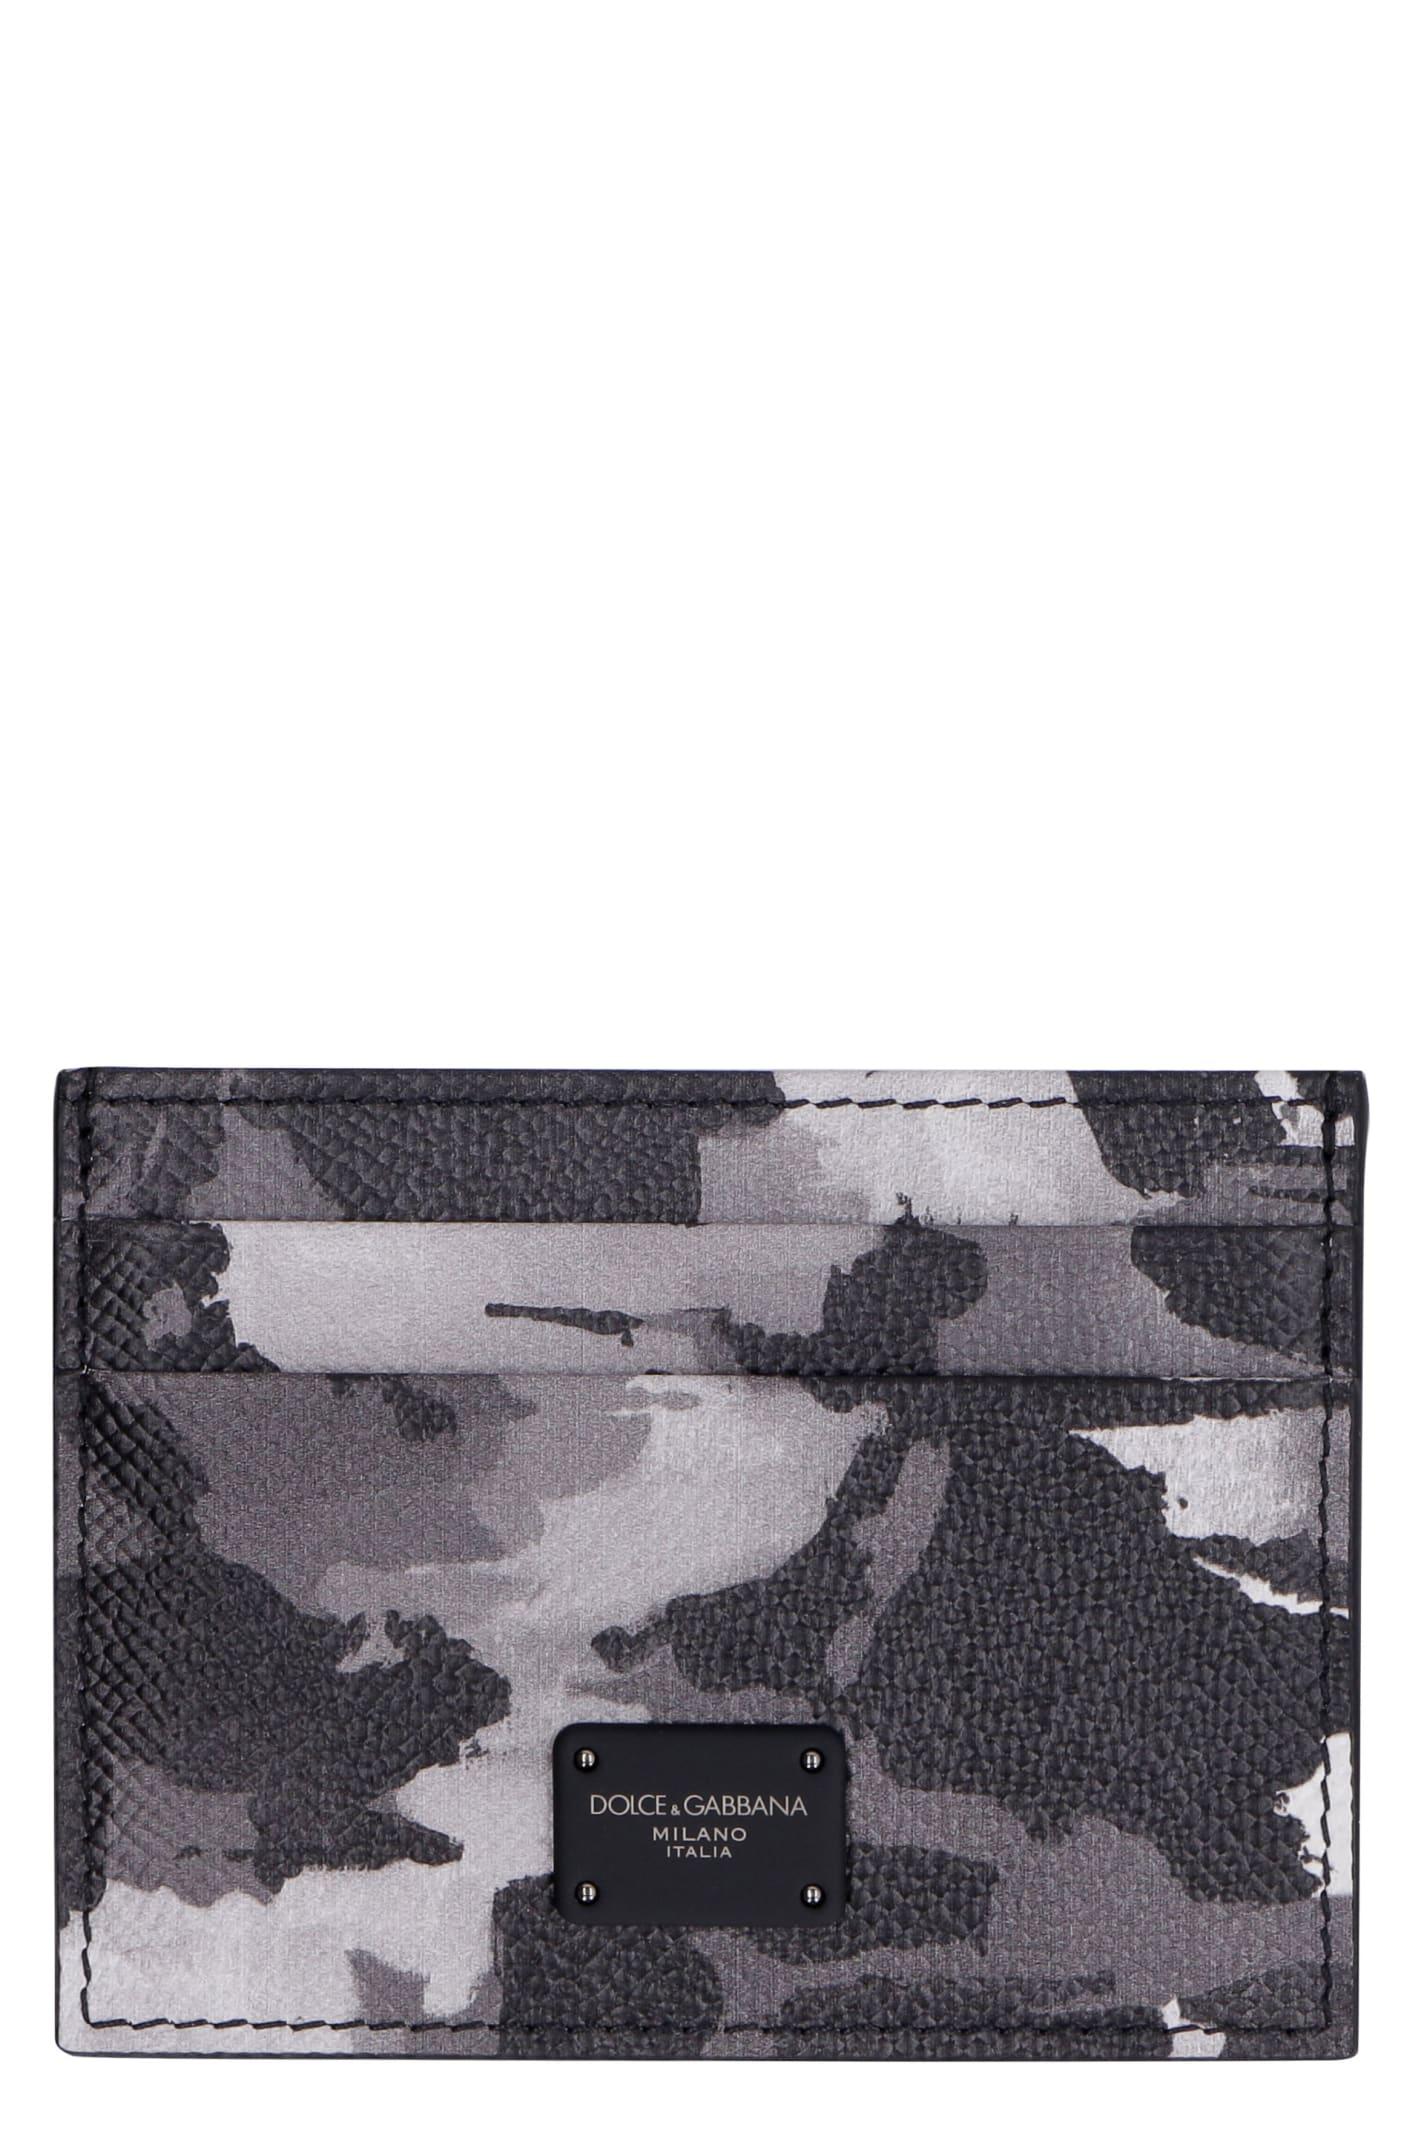 Dolce & Gabbana Printed Leather Card Holder